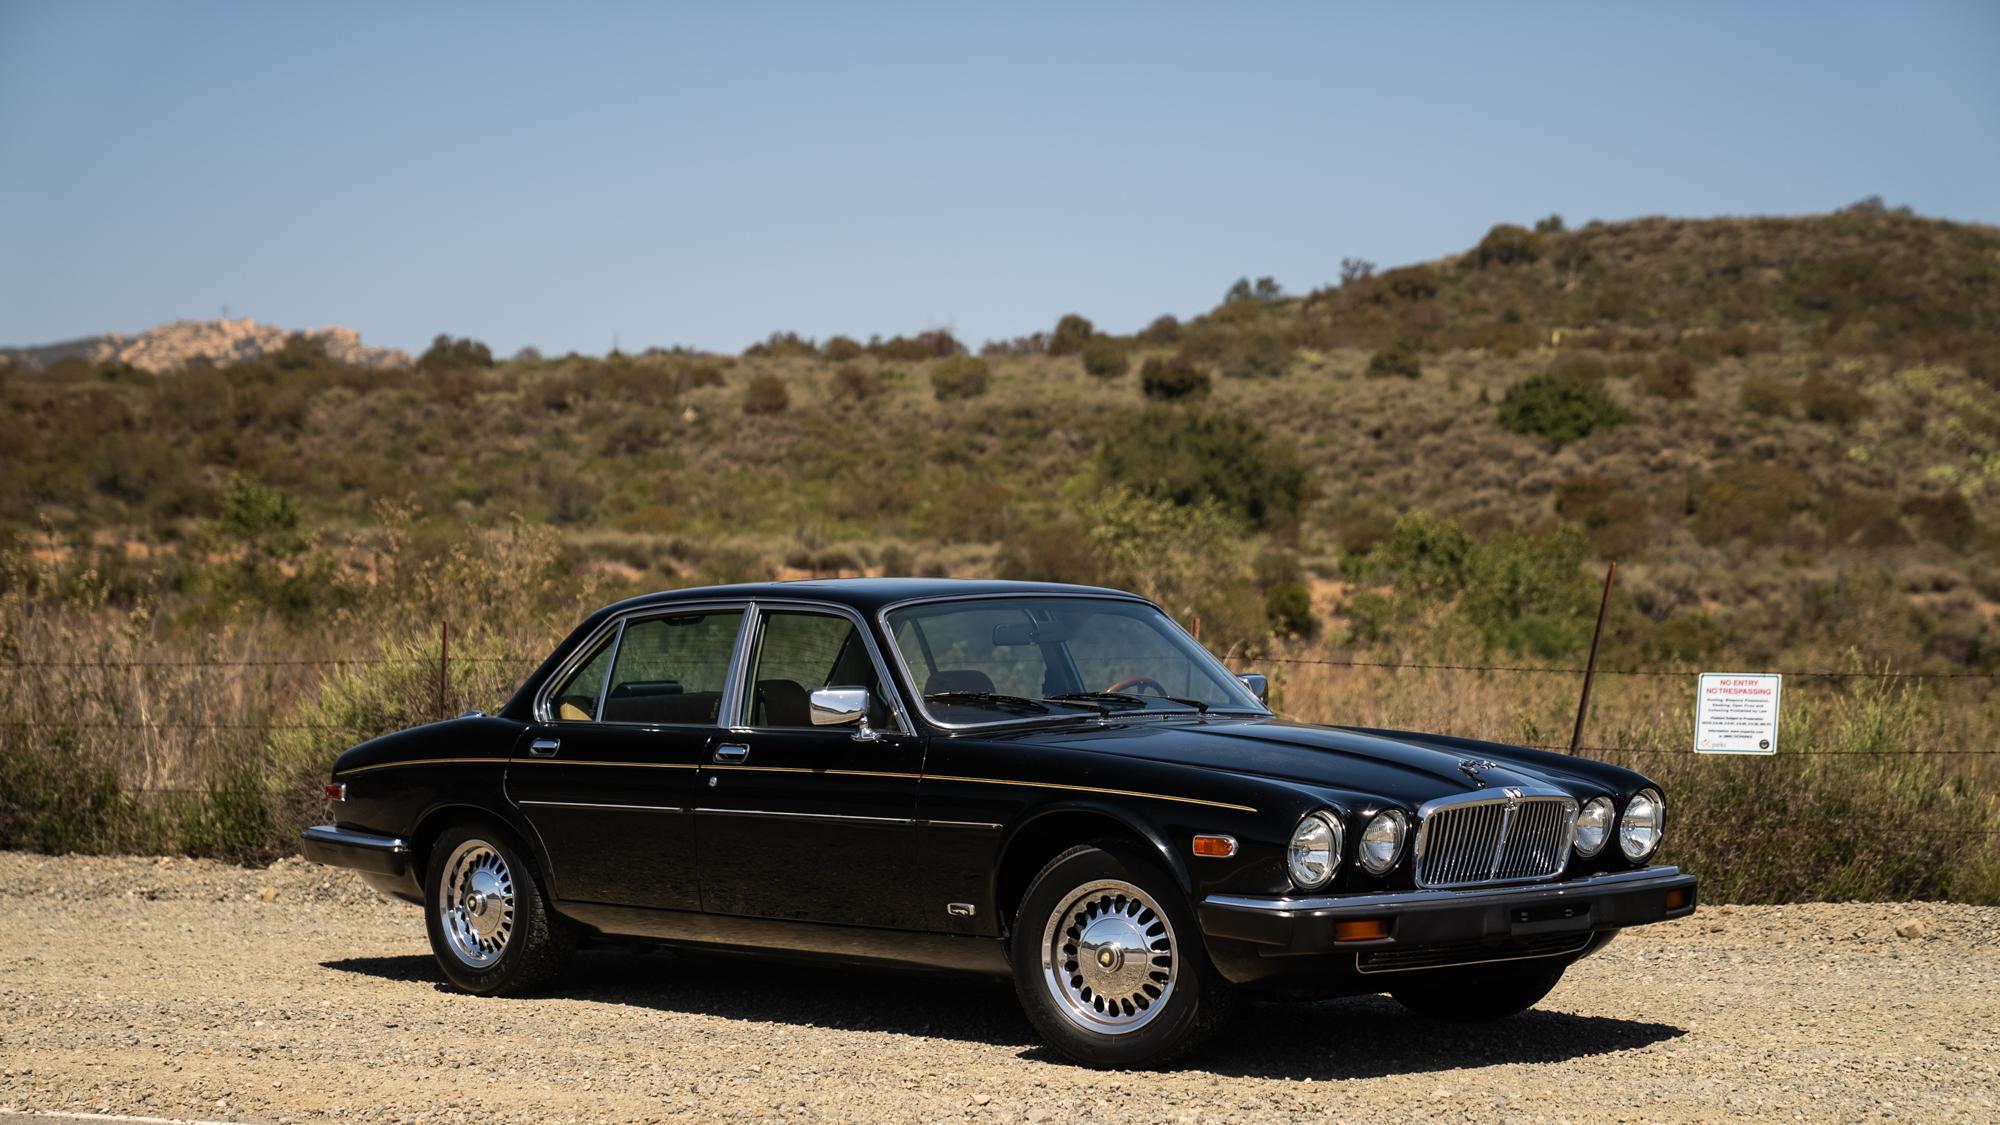 1986 Jaguar XJ6 front side